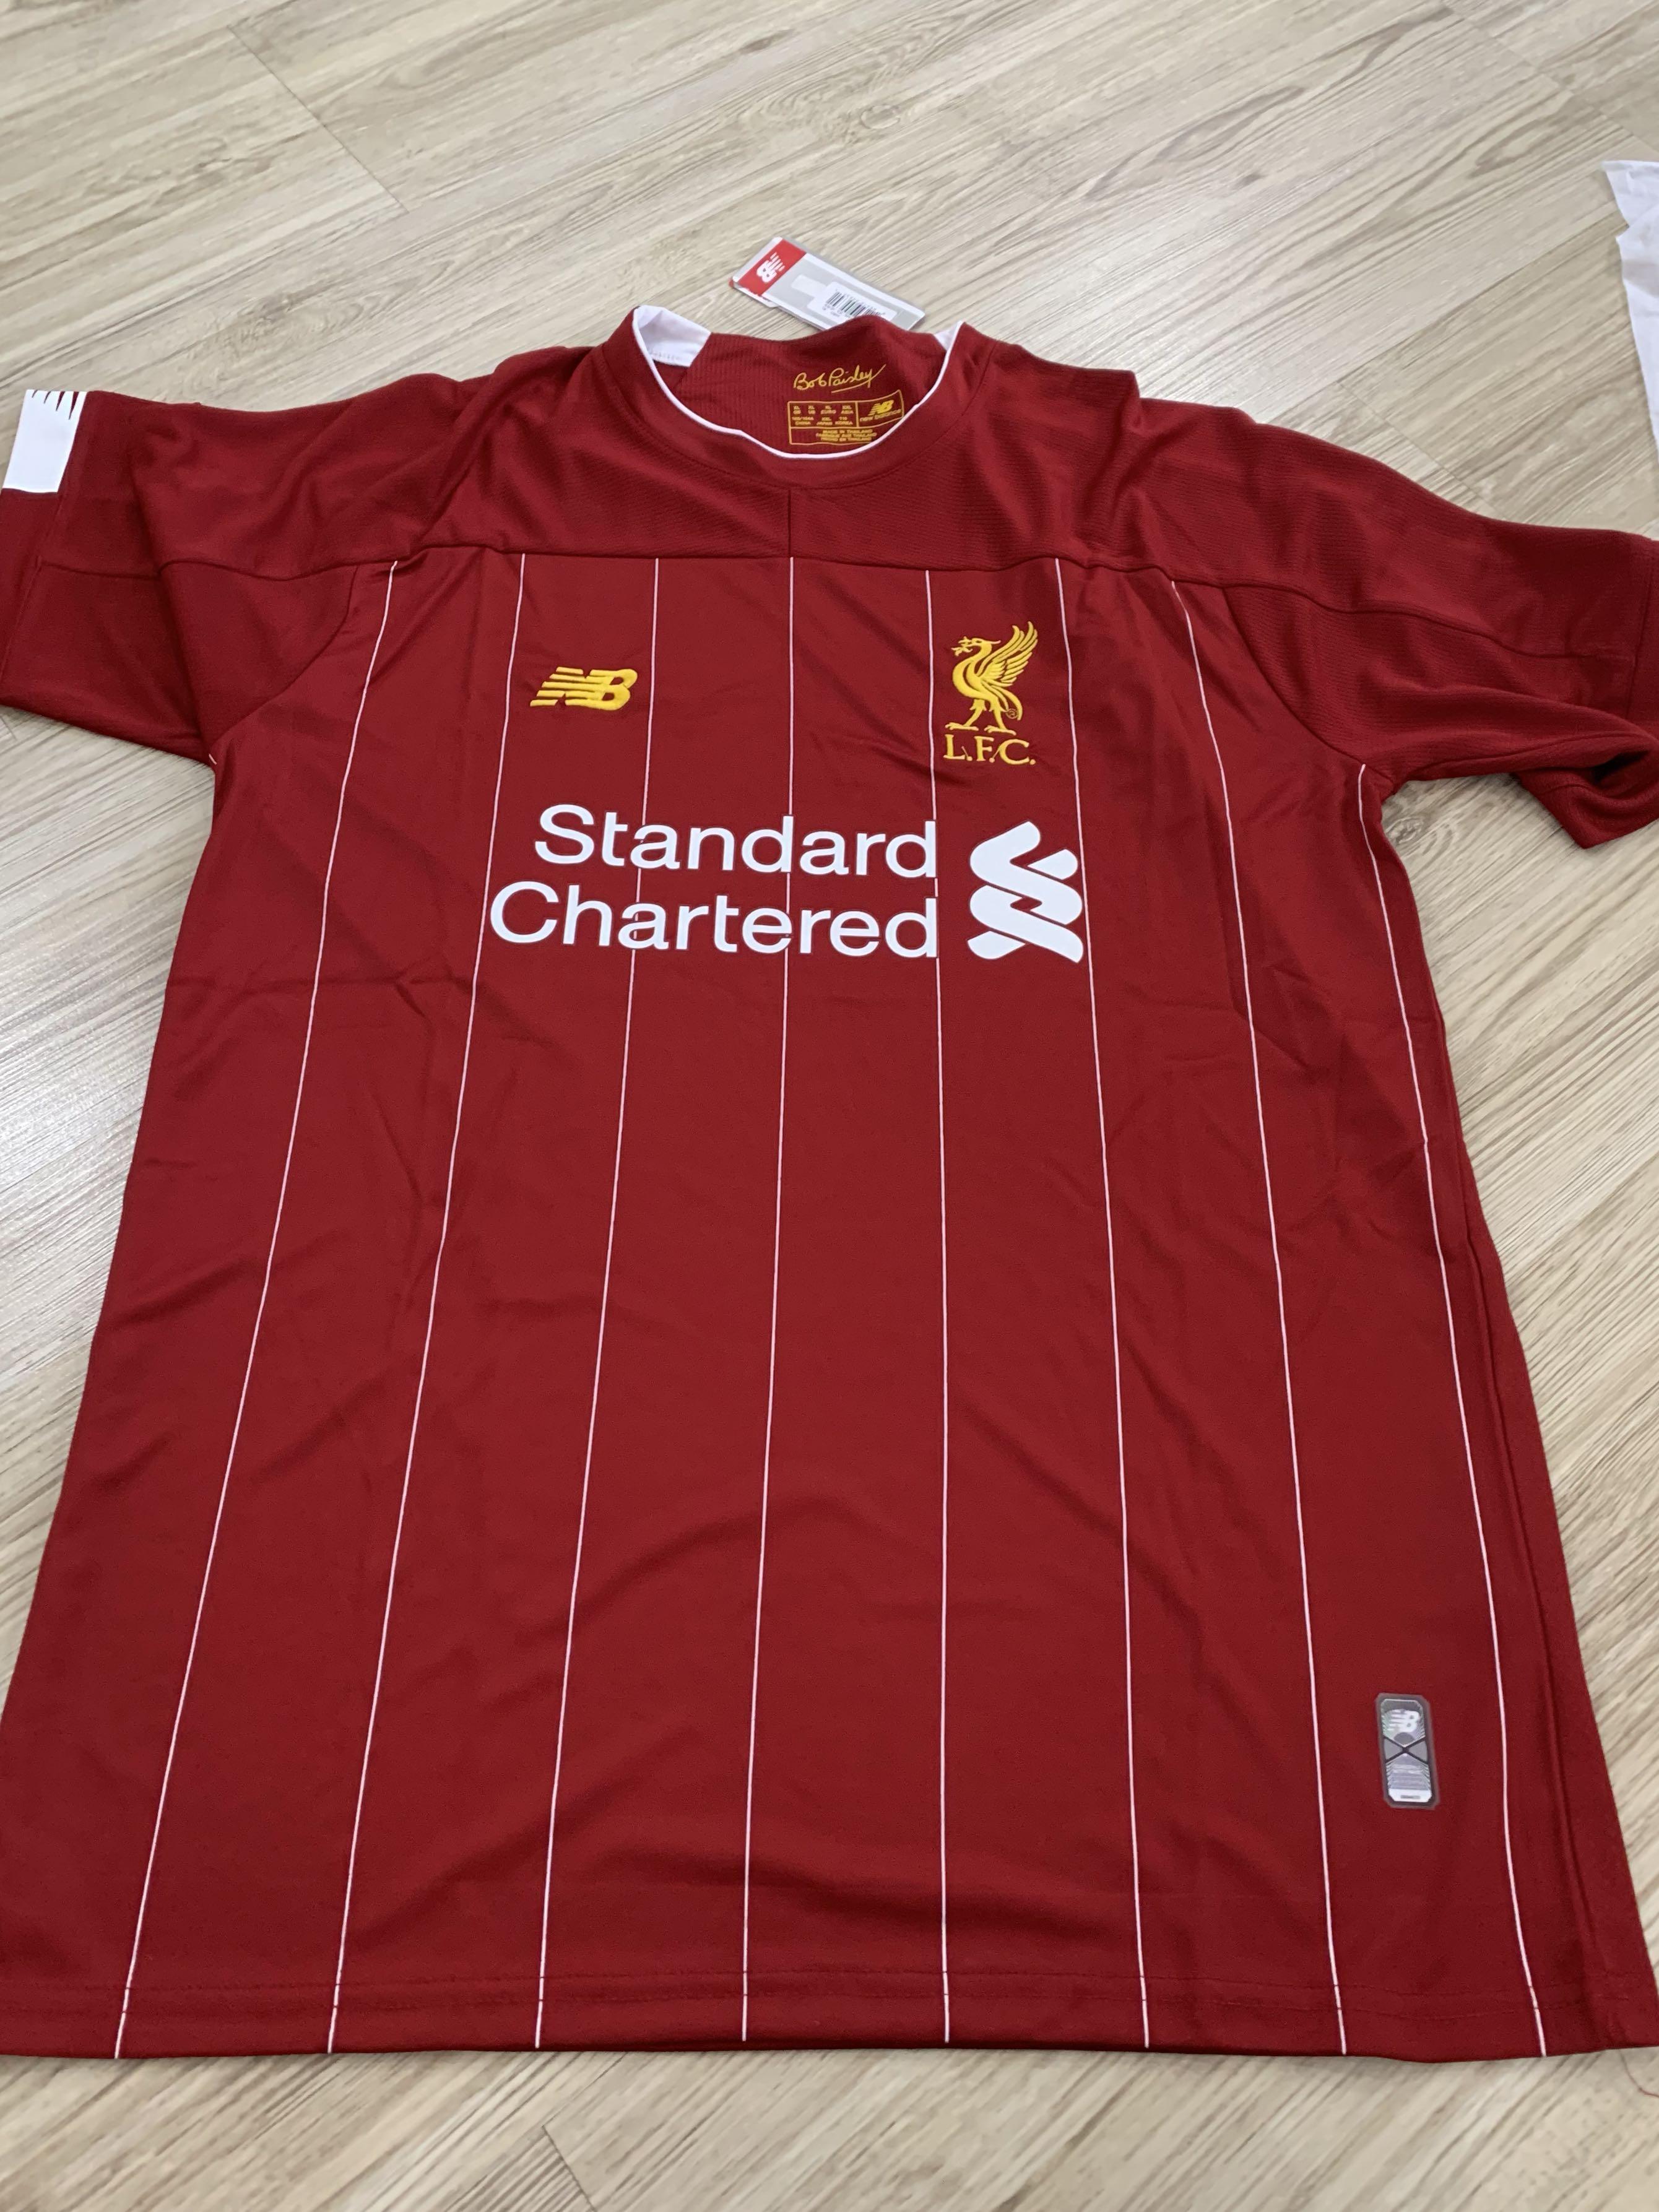 1a0c280c330 ❗️NEW❗️Liverpool jersey Liverpool home kit 19 20 2019 2020 Liverpool jersey  goalkeeper kit